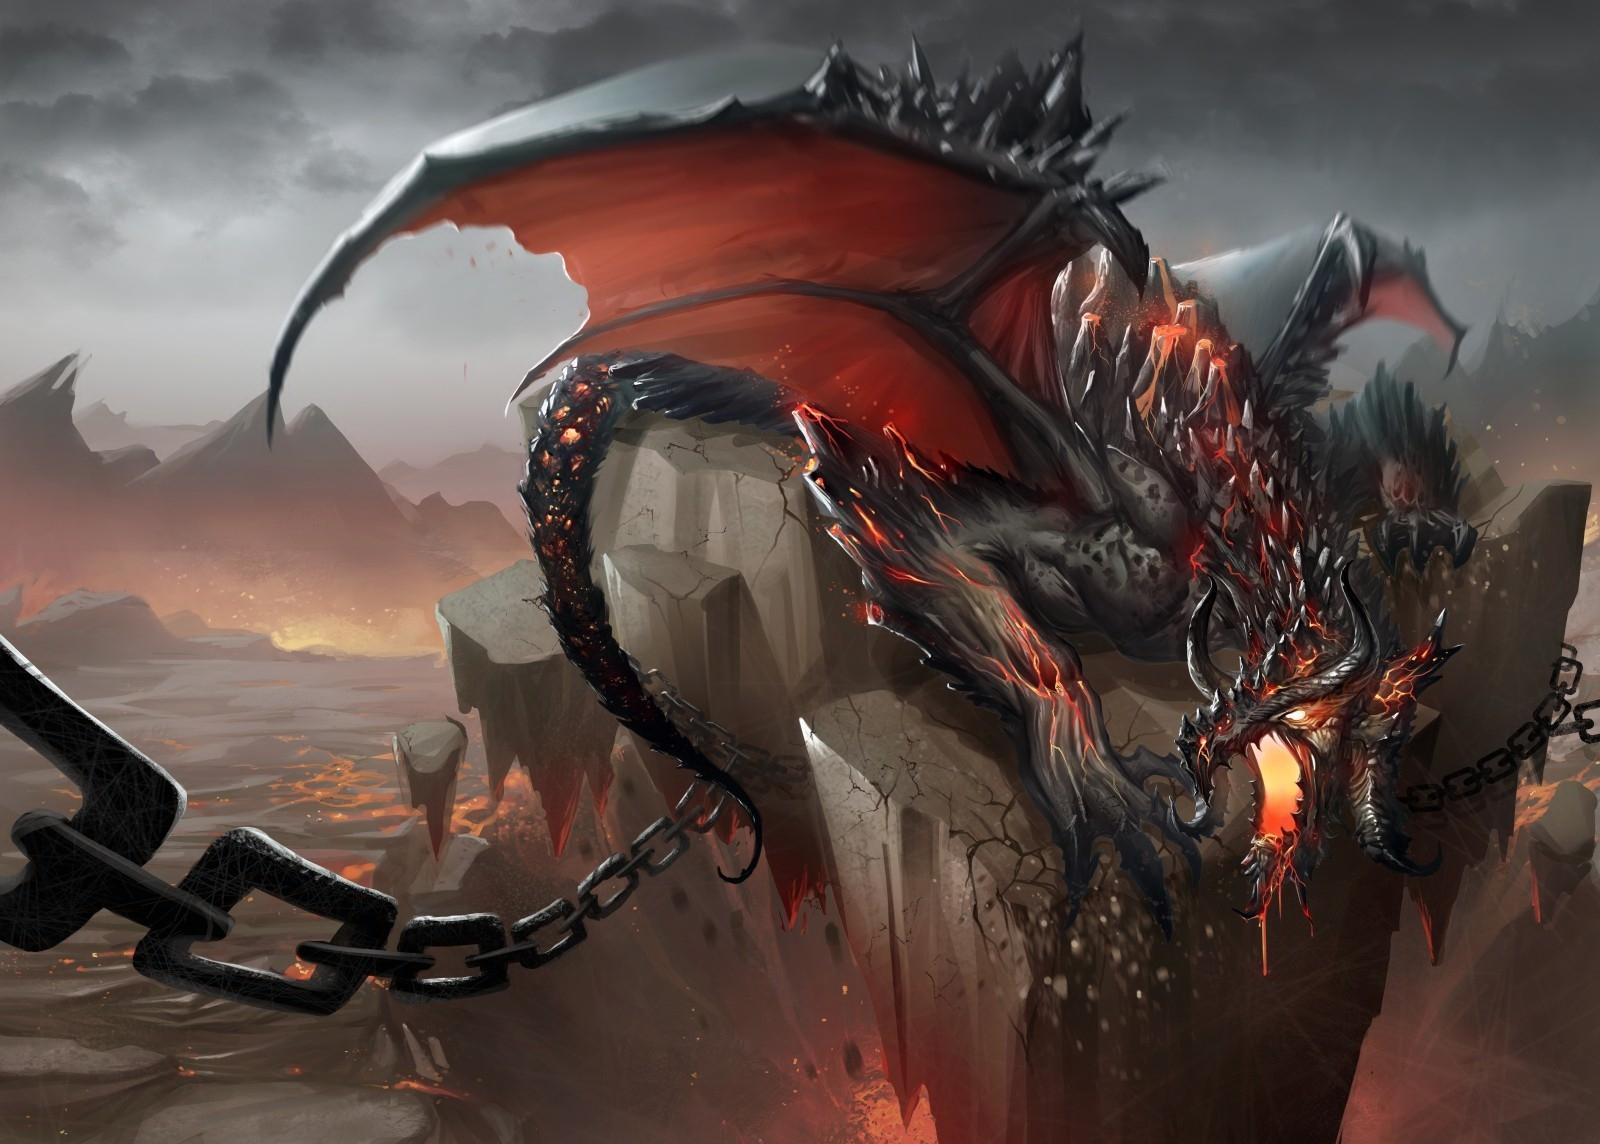 http://fc02.deviantart.net/fs71/f/2011/322/7/a/dragon_by_oustins-d4gje6d.jpg